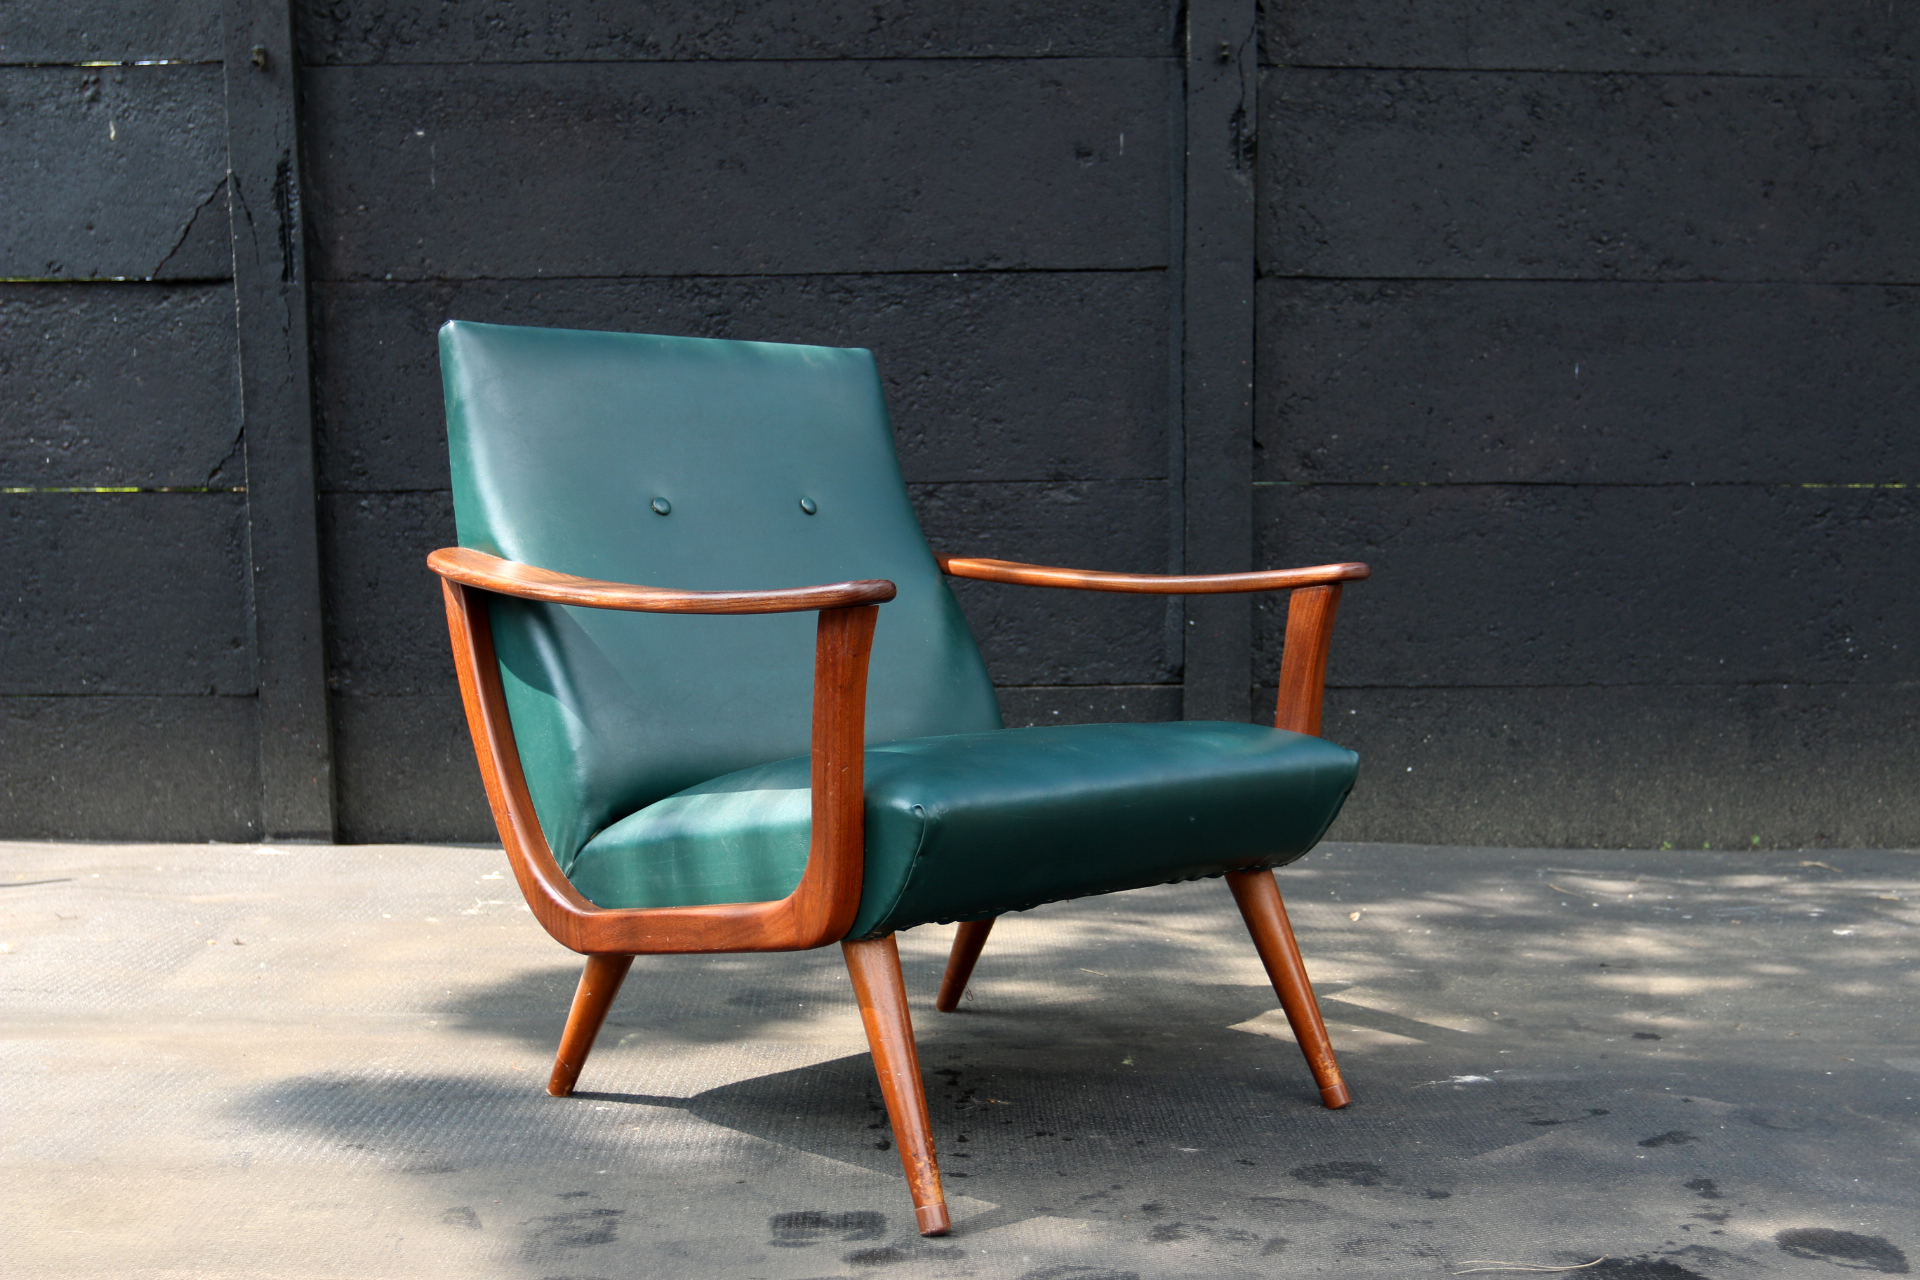 vintage design teakhout smaragdgroene fauteuil jaren 50 dehuiszwaluw. Black Bedroom Furniture Sets. Home Design Ideas